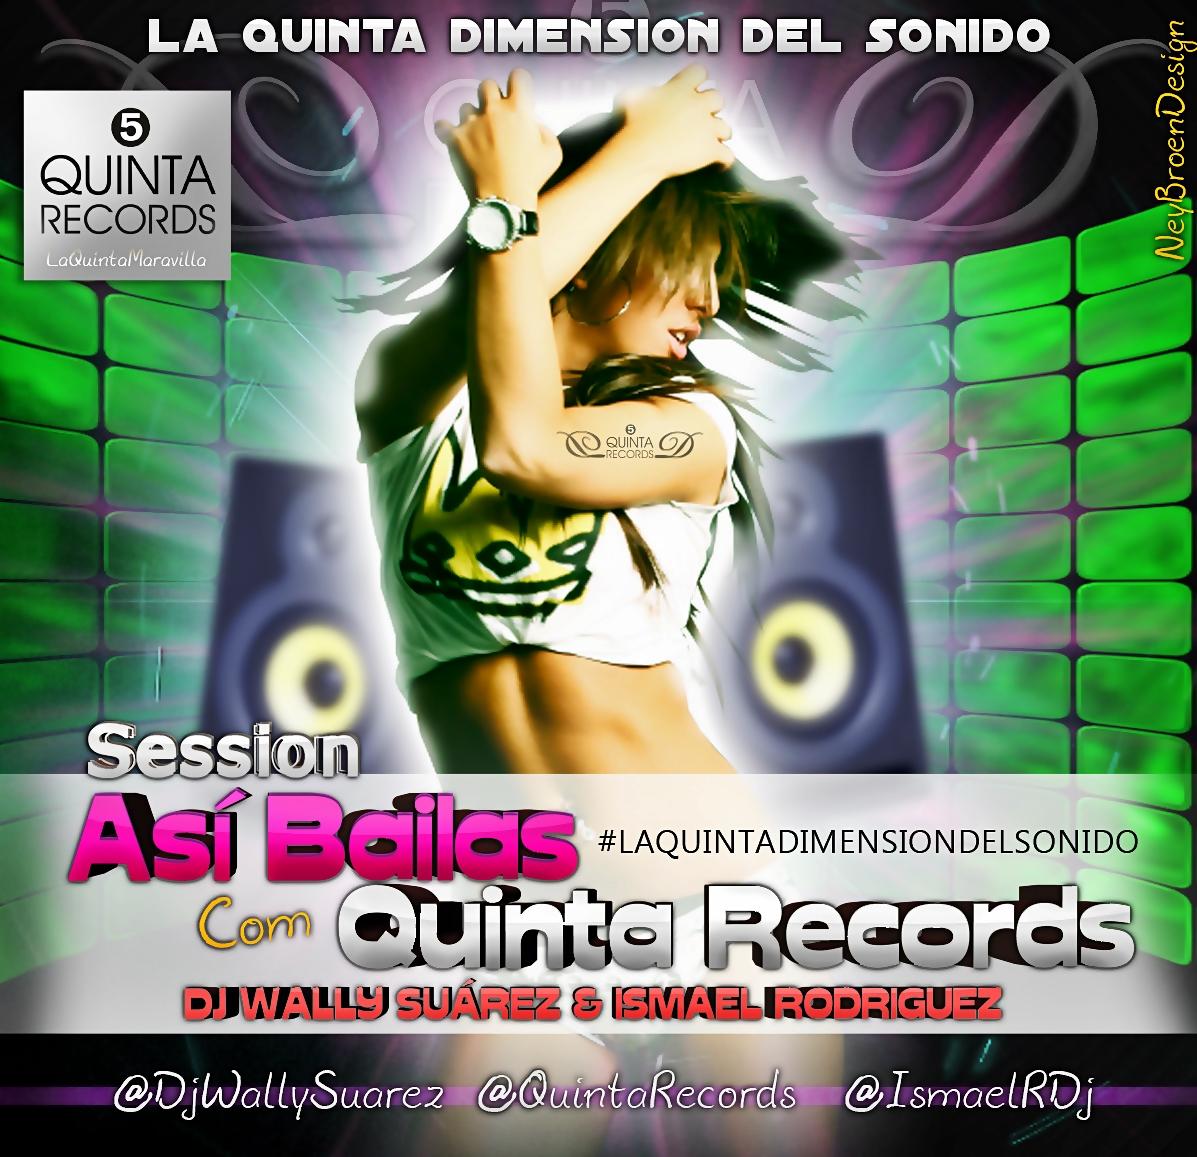 Dj Wally Suarez: Sesion Asì Bailas Con Quinta Records (Dj